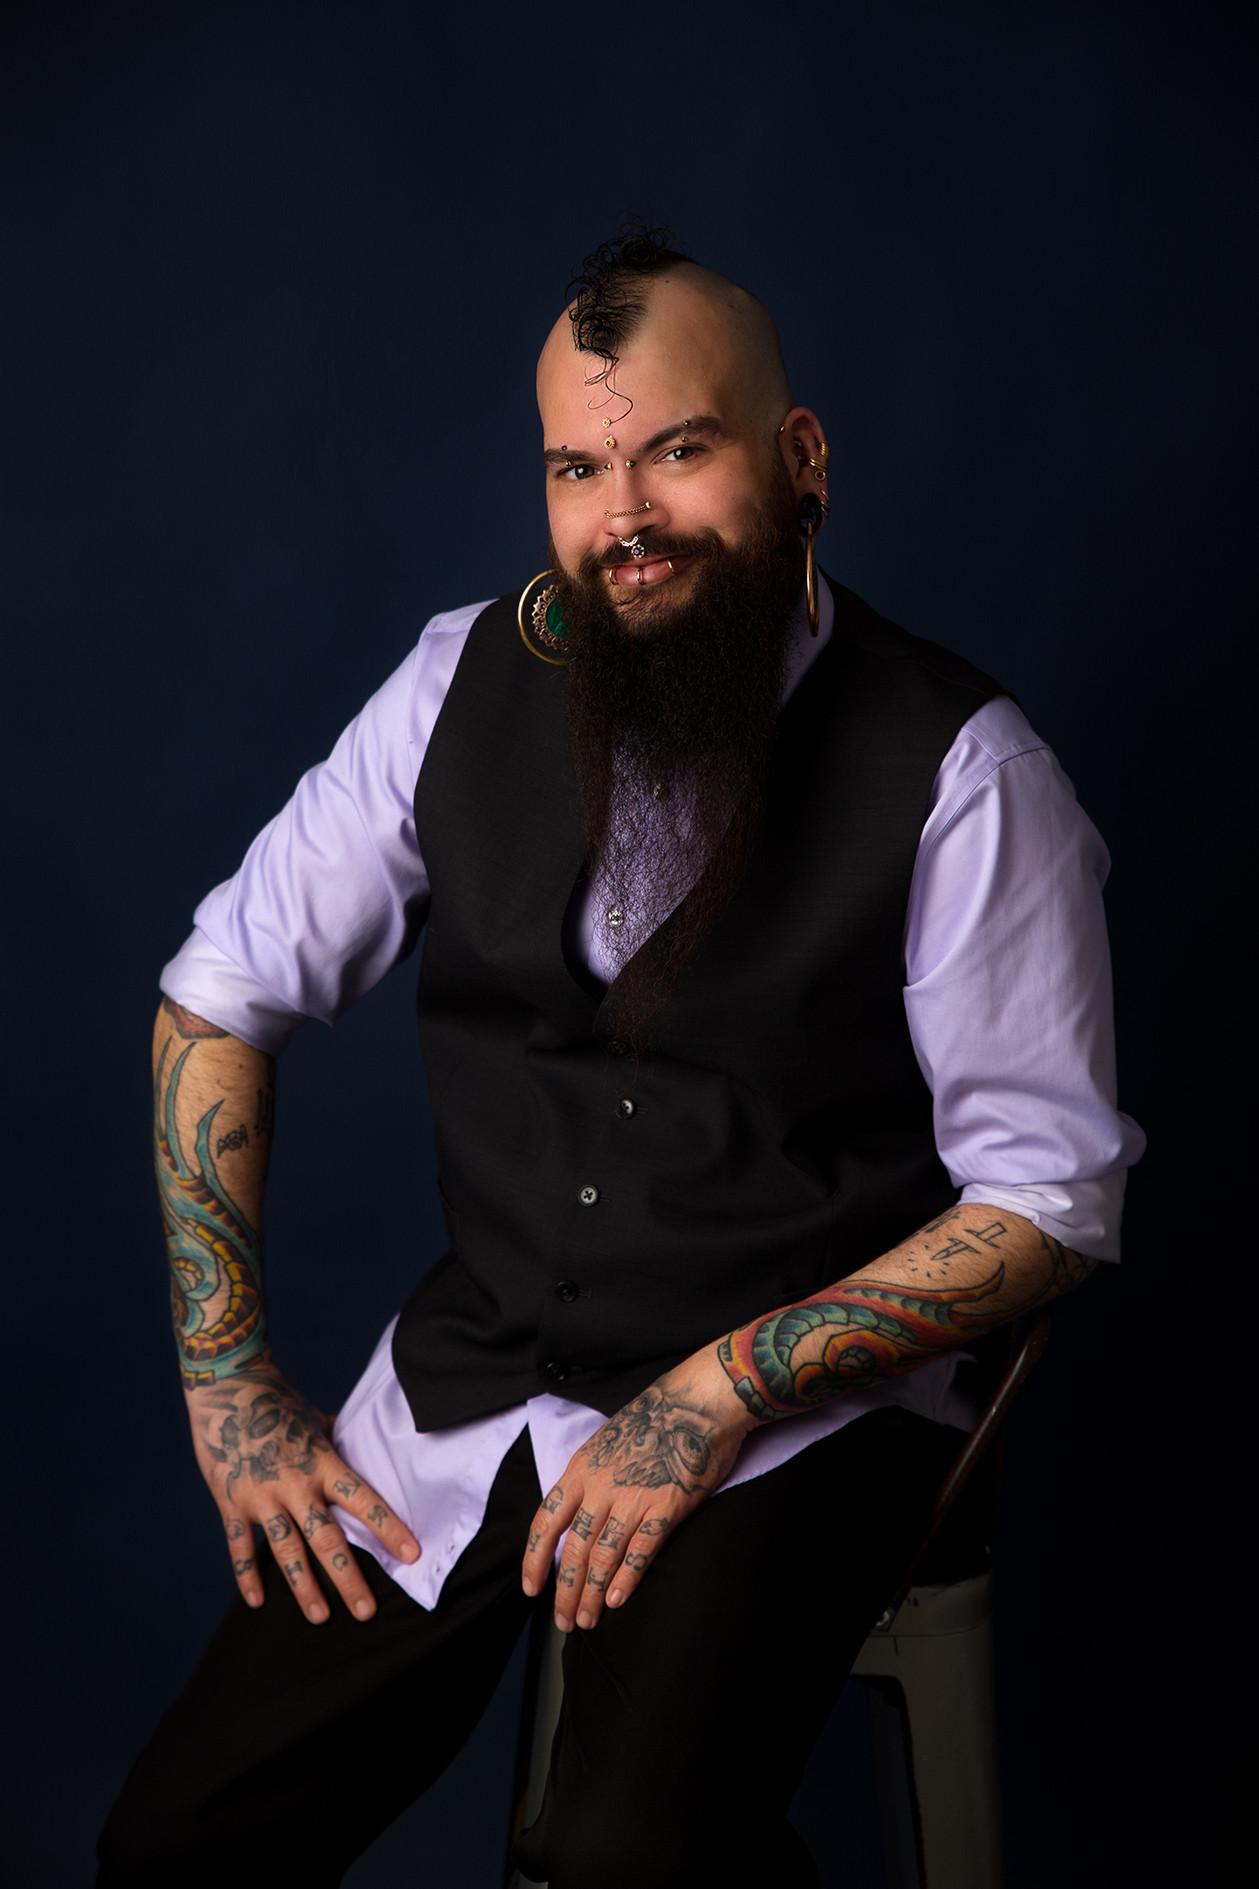 Jon | Headshot Studio Session | Cambridge-Minneapolis, MN Portrait Photographer